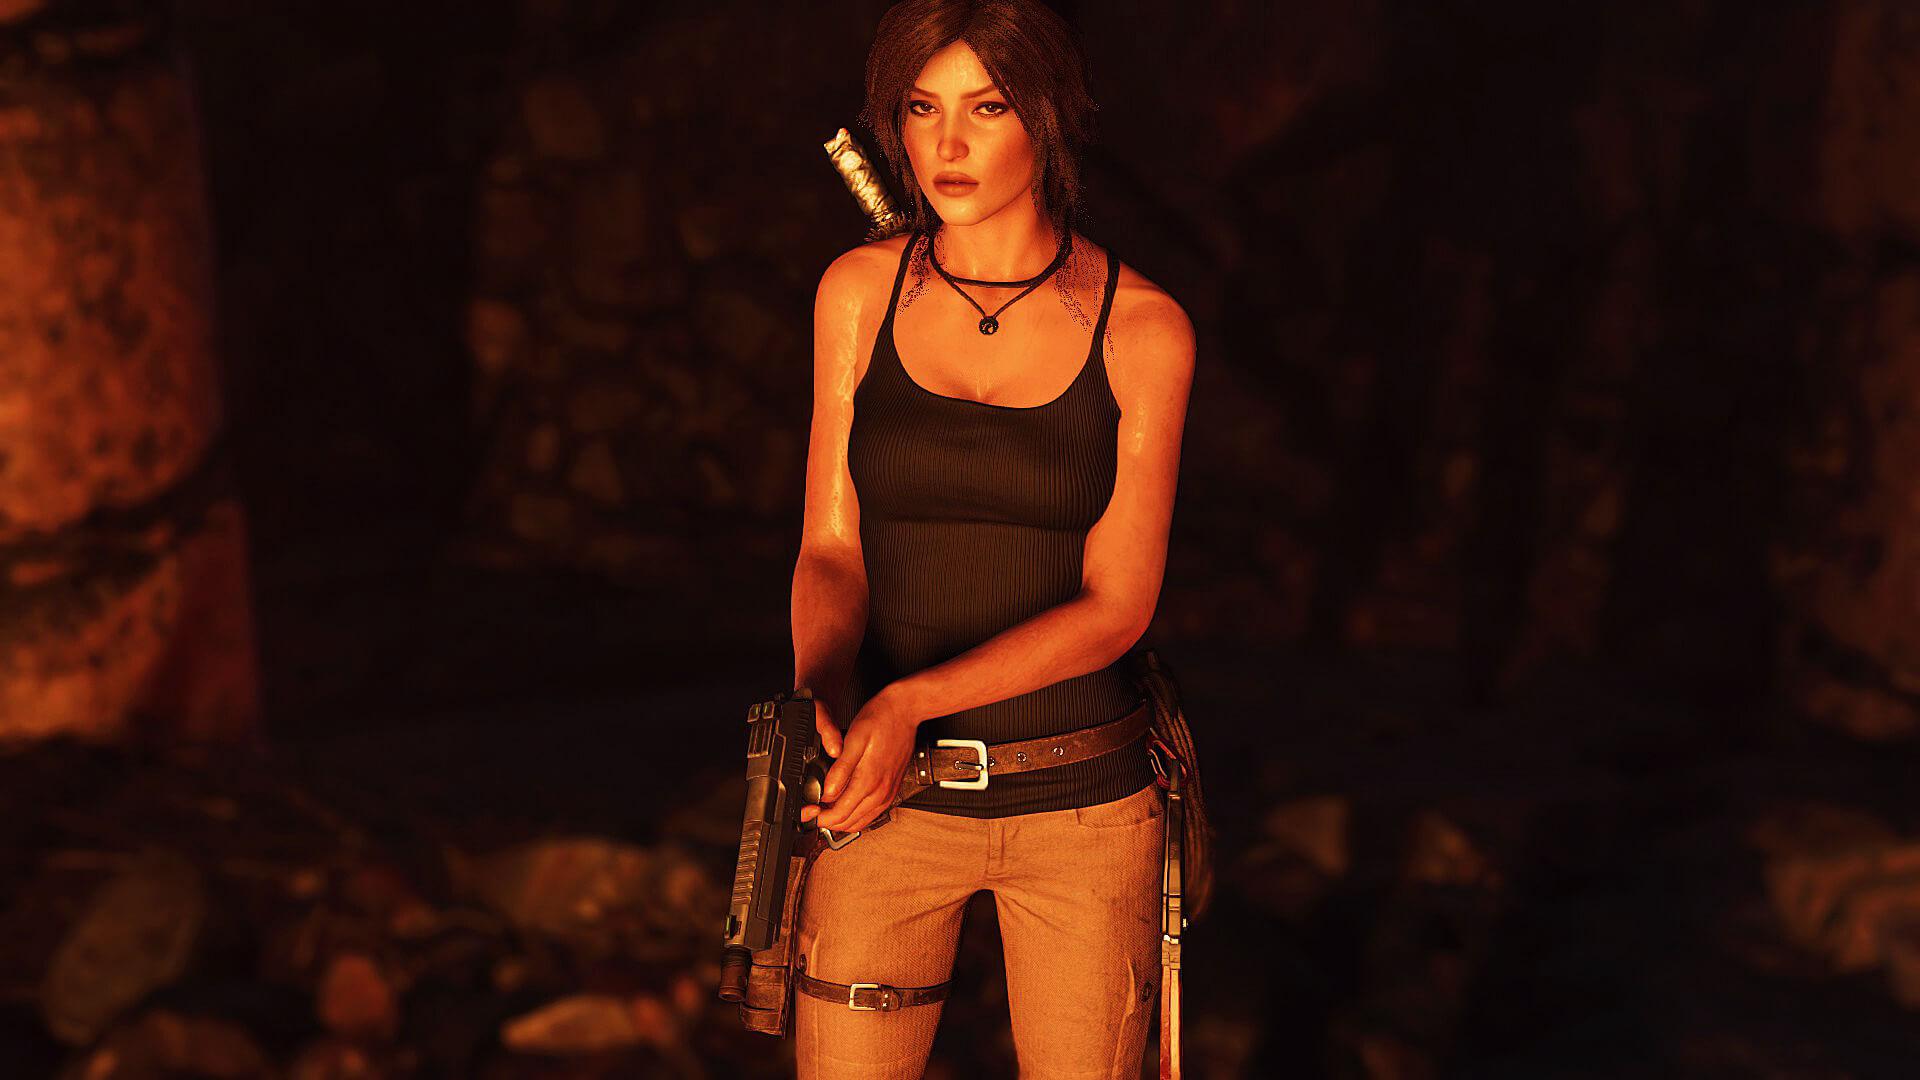 Tomb Raider 2013 Lara Croft Nude Mod - YouTube